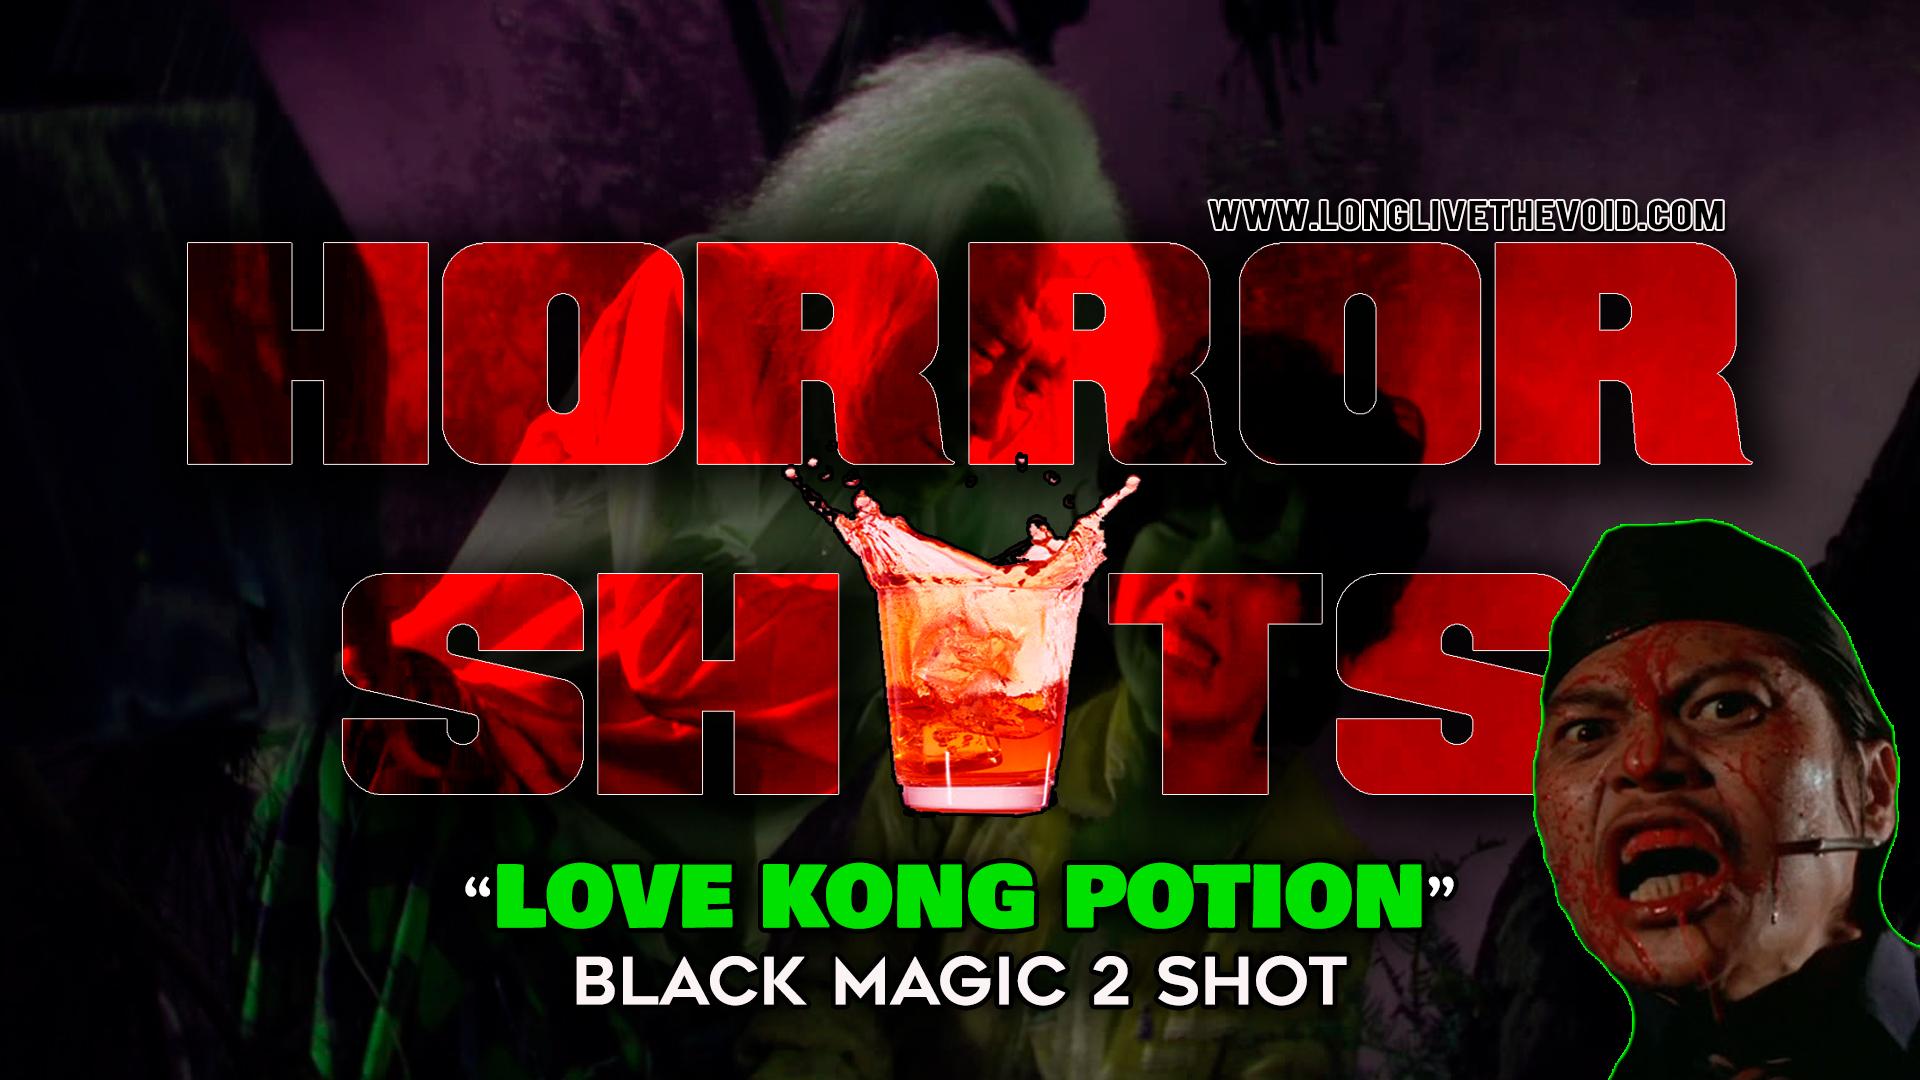 LOVE-KONG-POTION-black-magic-2-1976.jpg